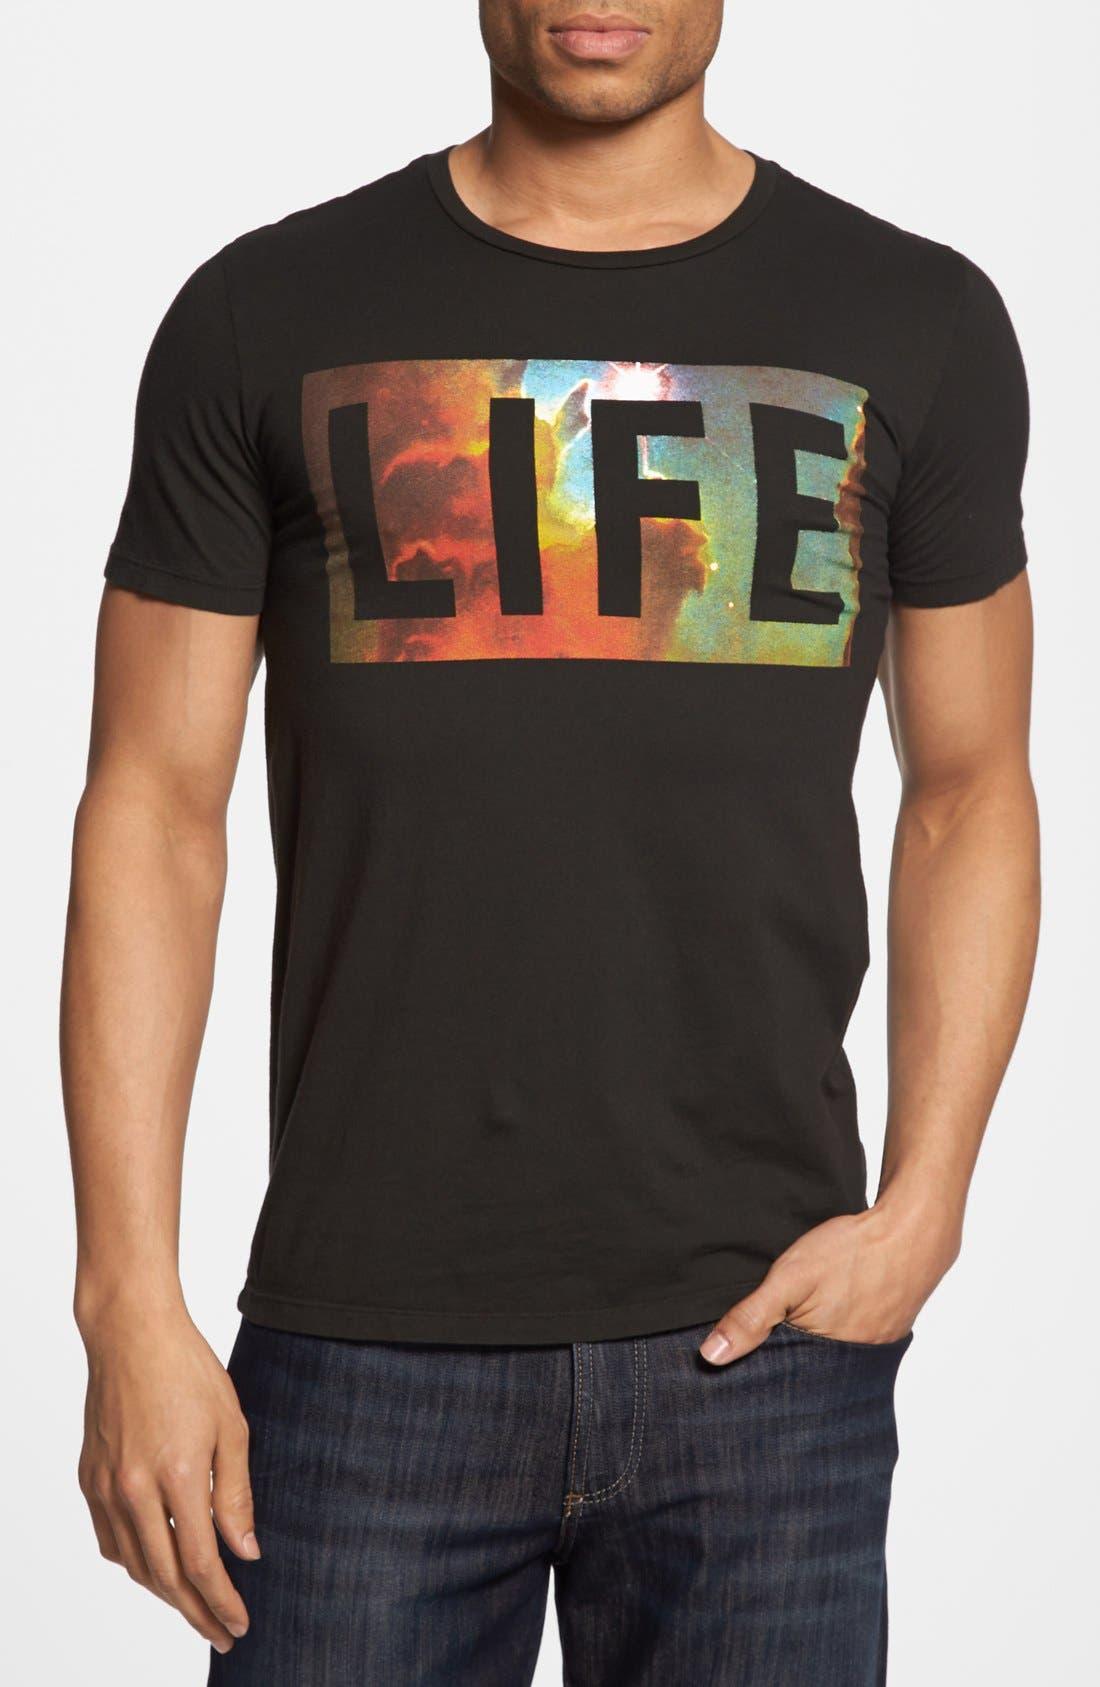 Alternate Image 1 Selected - Altru 'LIFE Nebula' T-Shirt